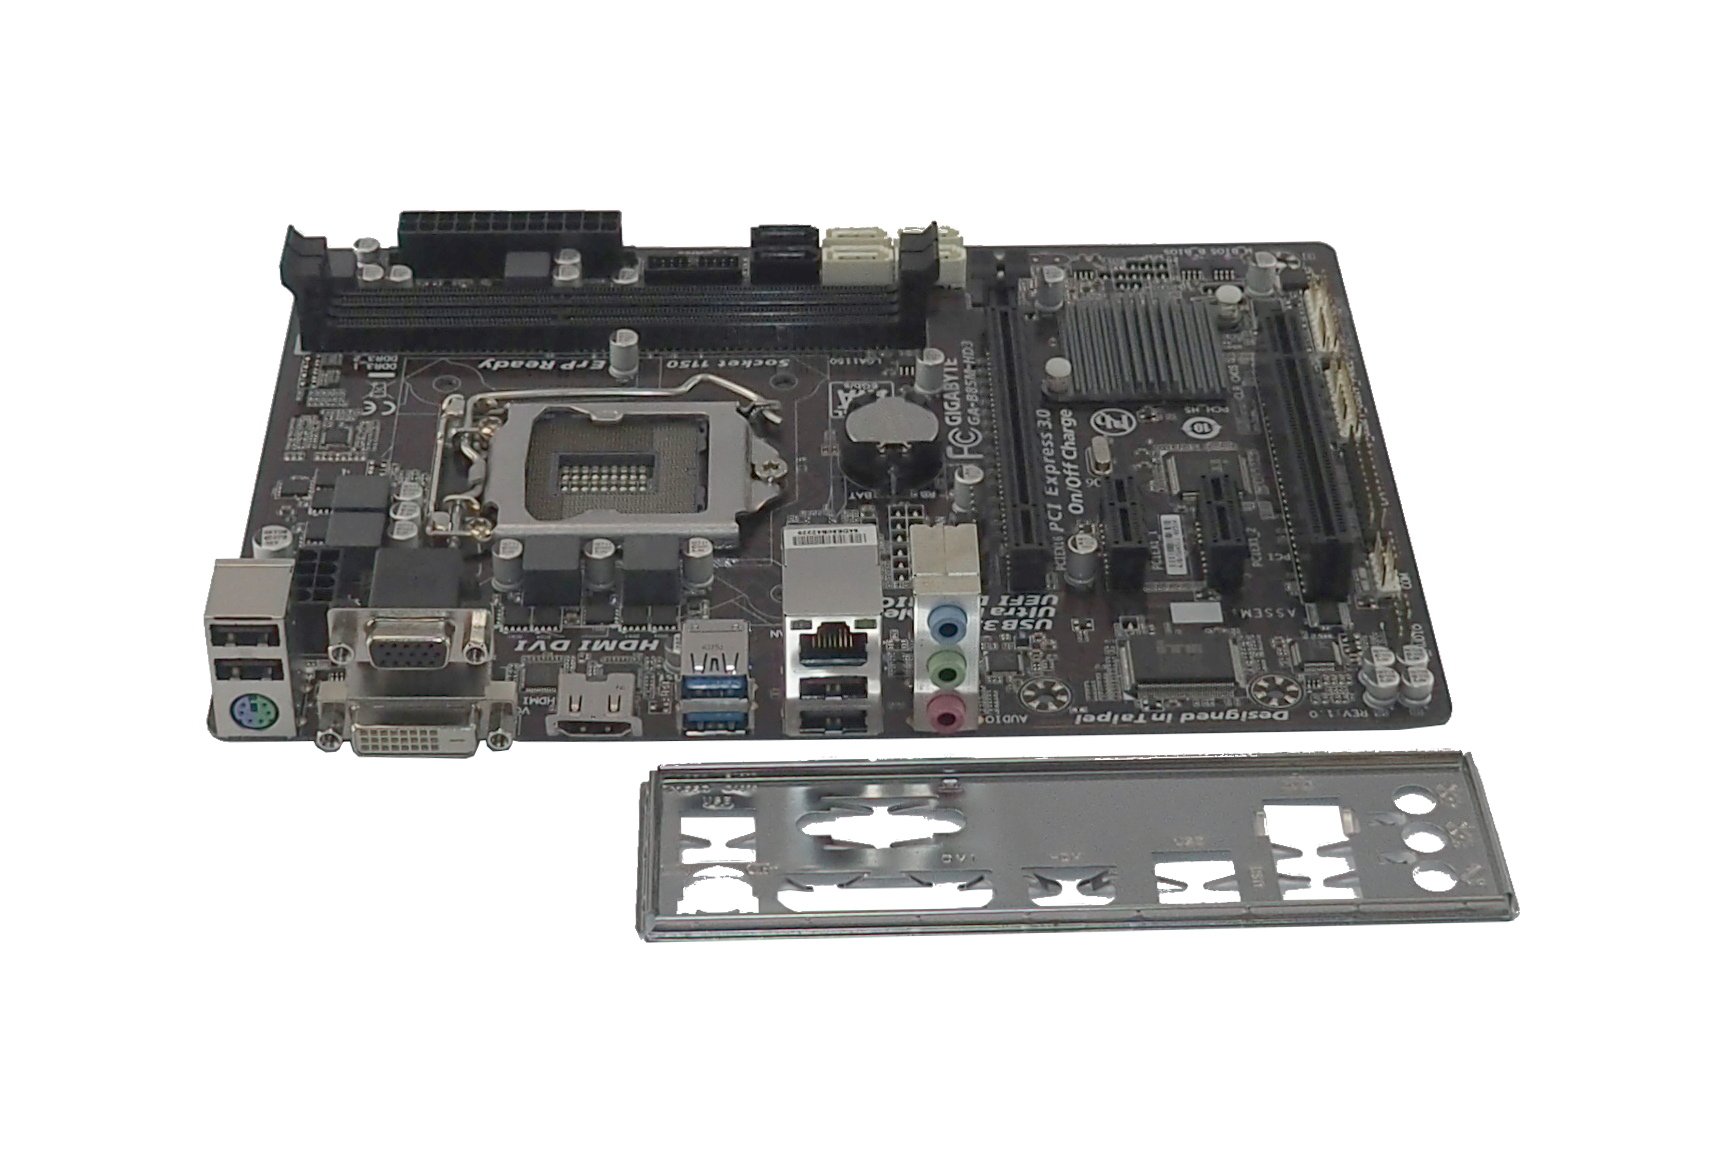 Gigabyte GA-B85M-HD3 Rev:1.0 UEFI Dual BIOS Socket 1150 Motherboard